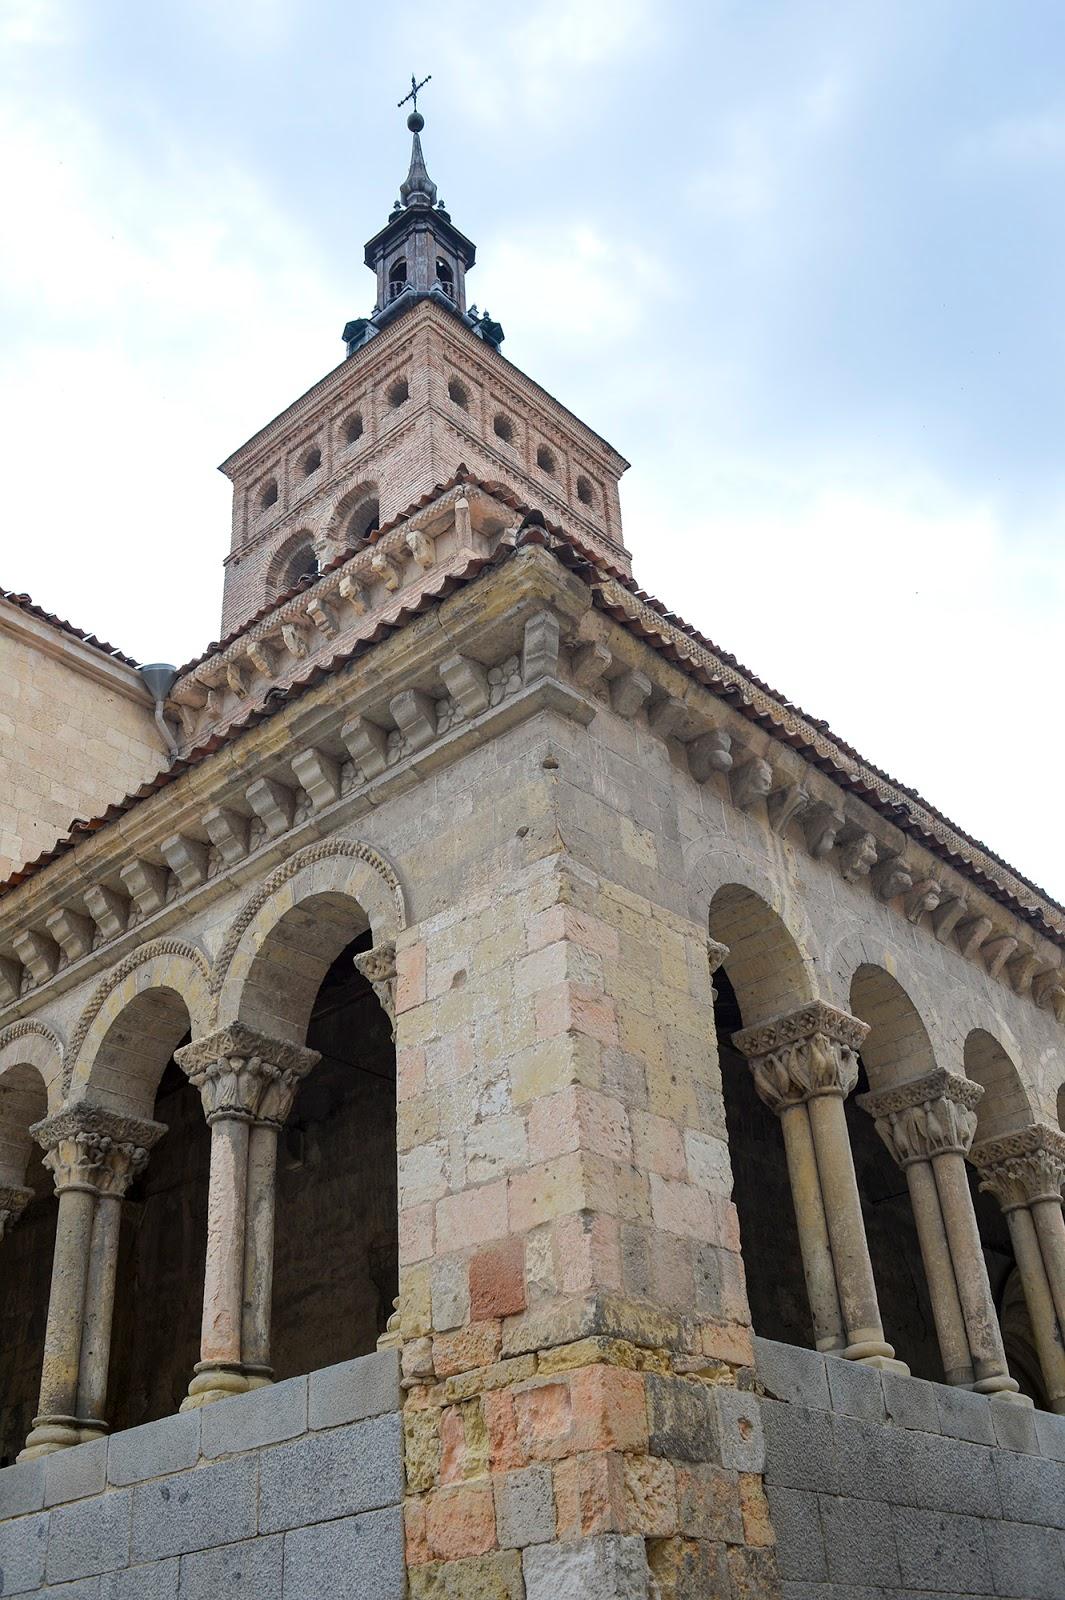 segovia spain travel guide weekend romanesque